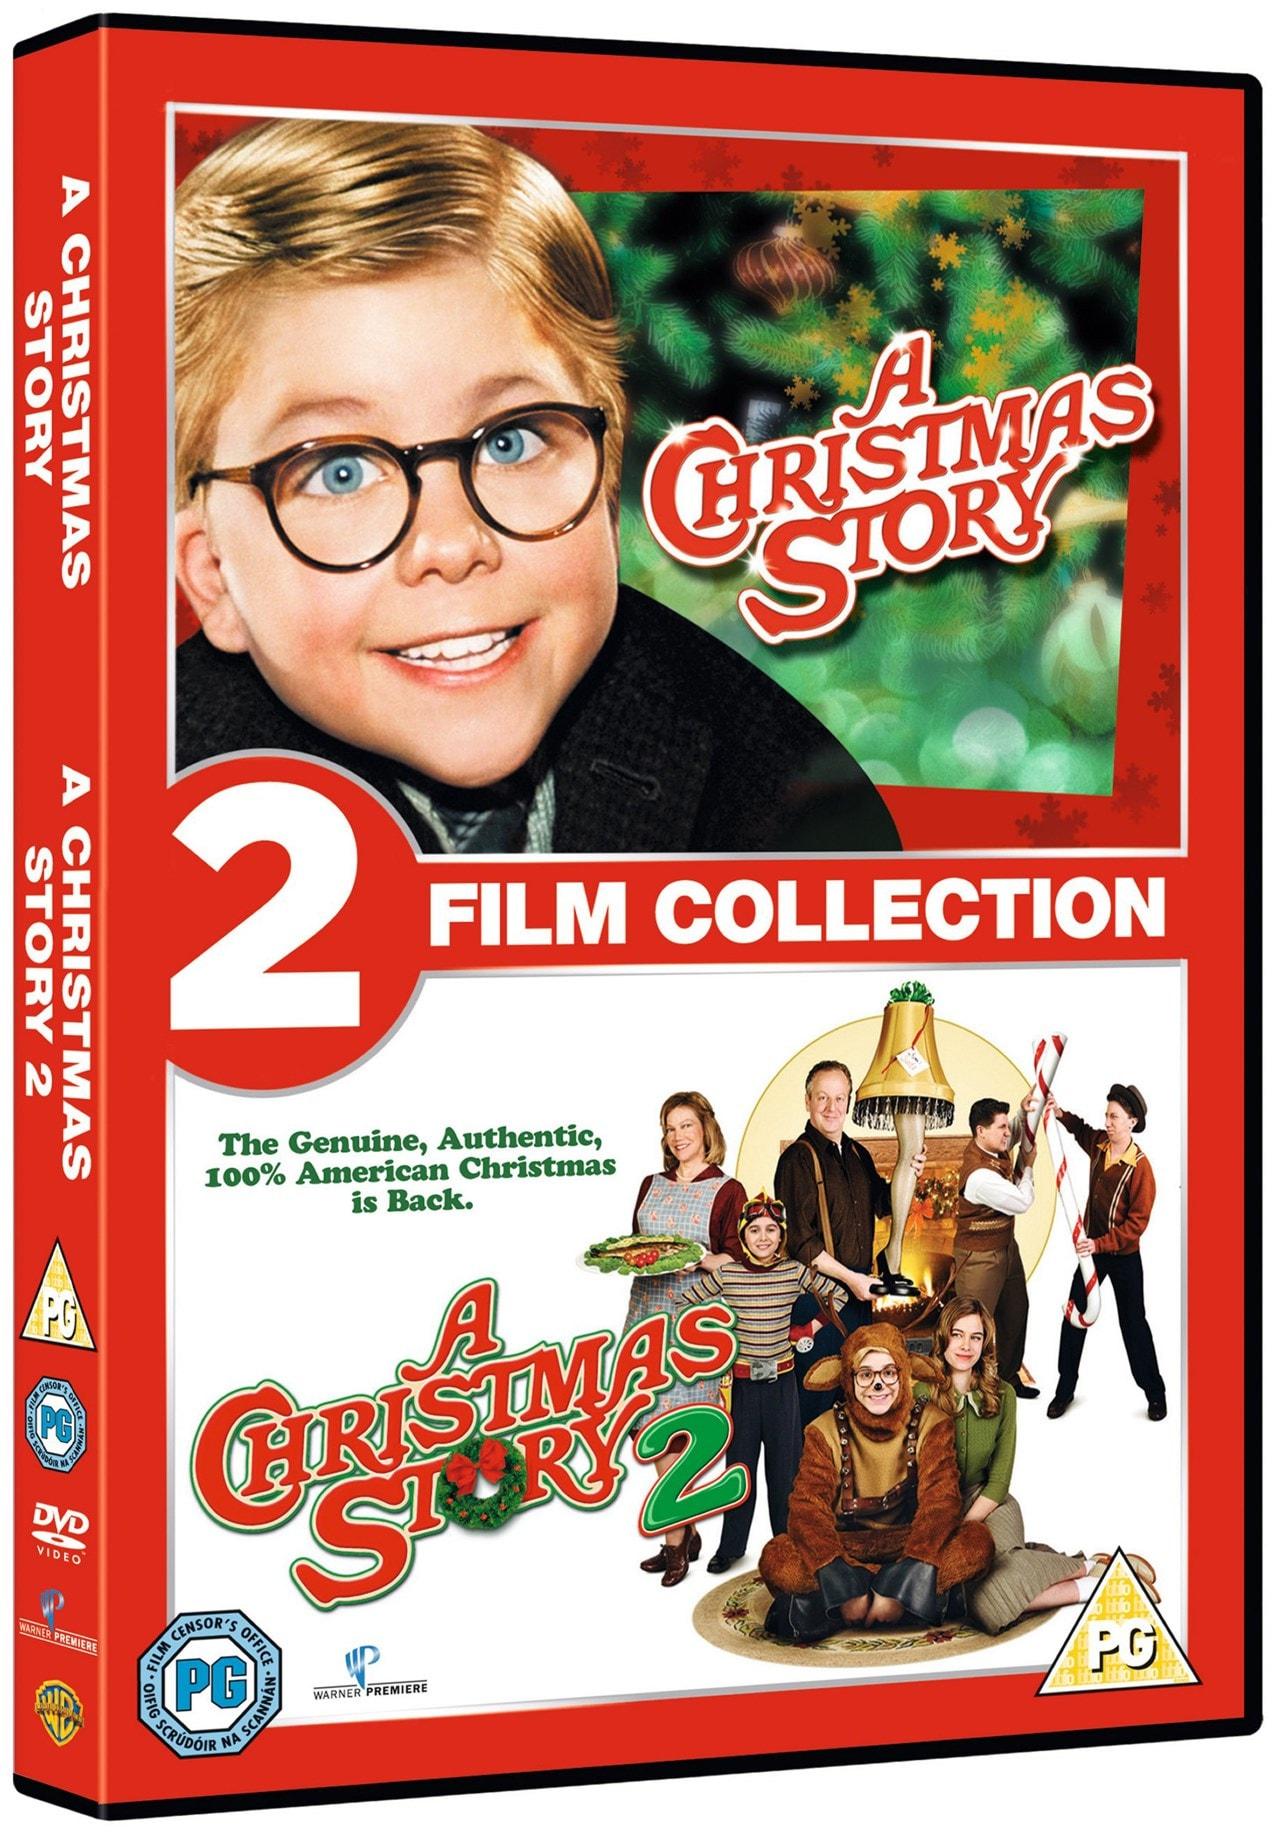 A Christmas Story/A Christmas Story 2 - 2